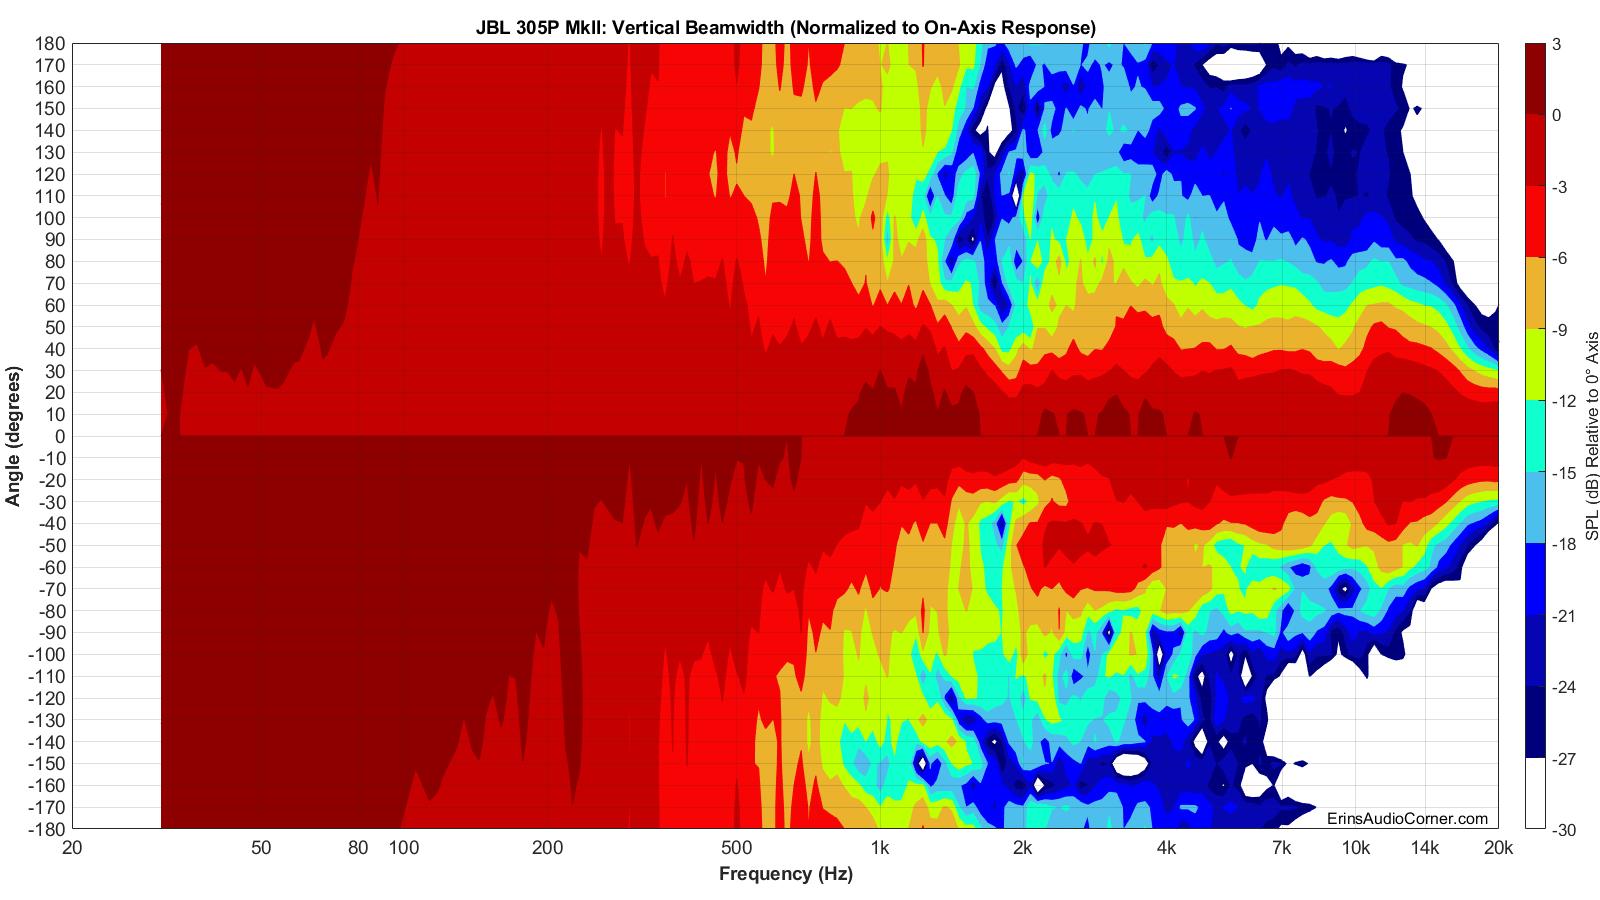 JBL%20305P%20MkII%20Beamwidth_Vertical.png